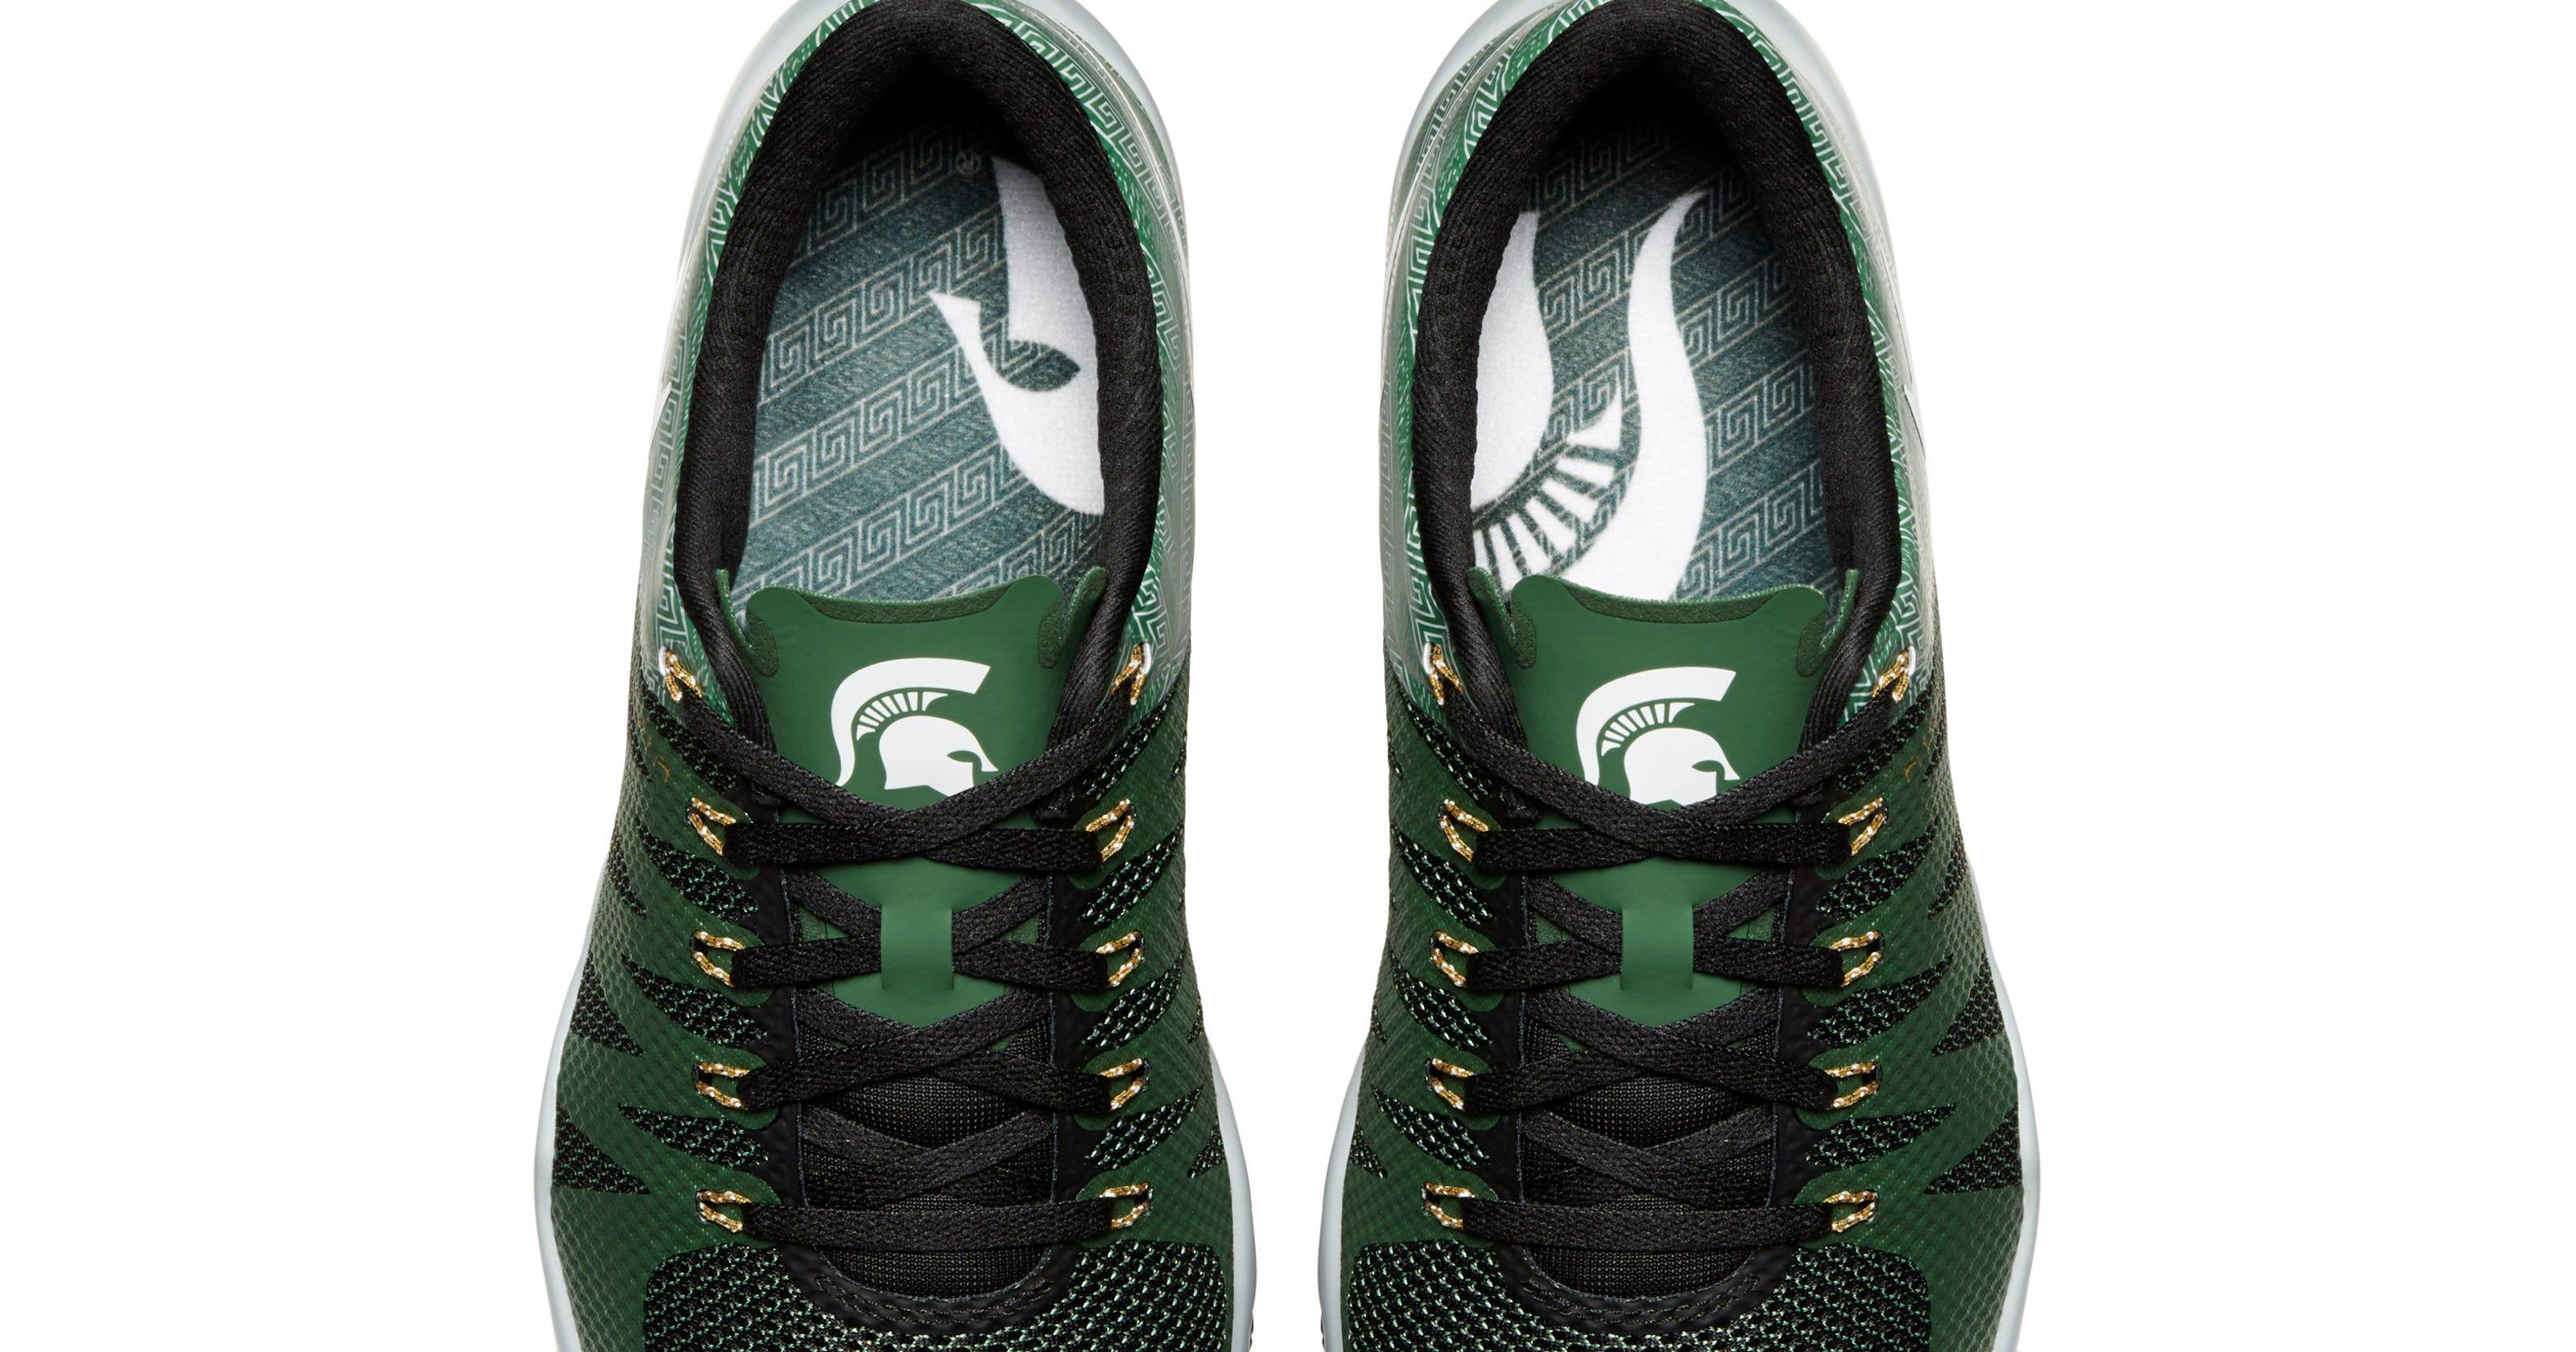 1c97e0b583a9 Just Spartan it  Nike s Michigan State gear debuts